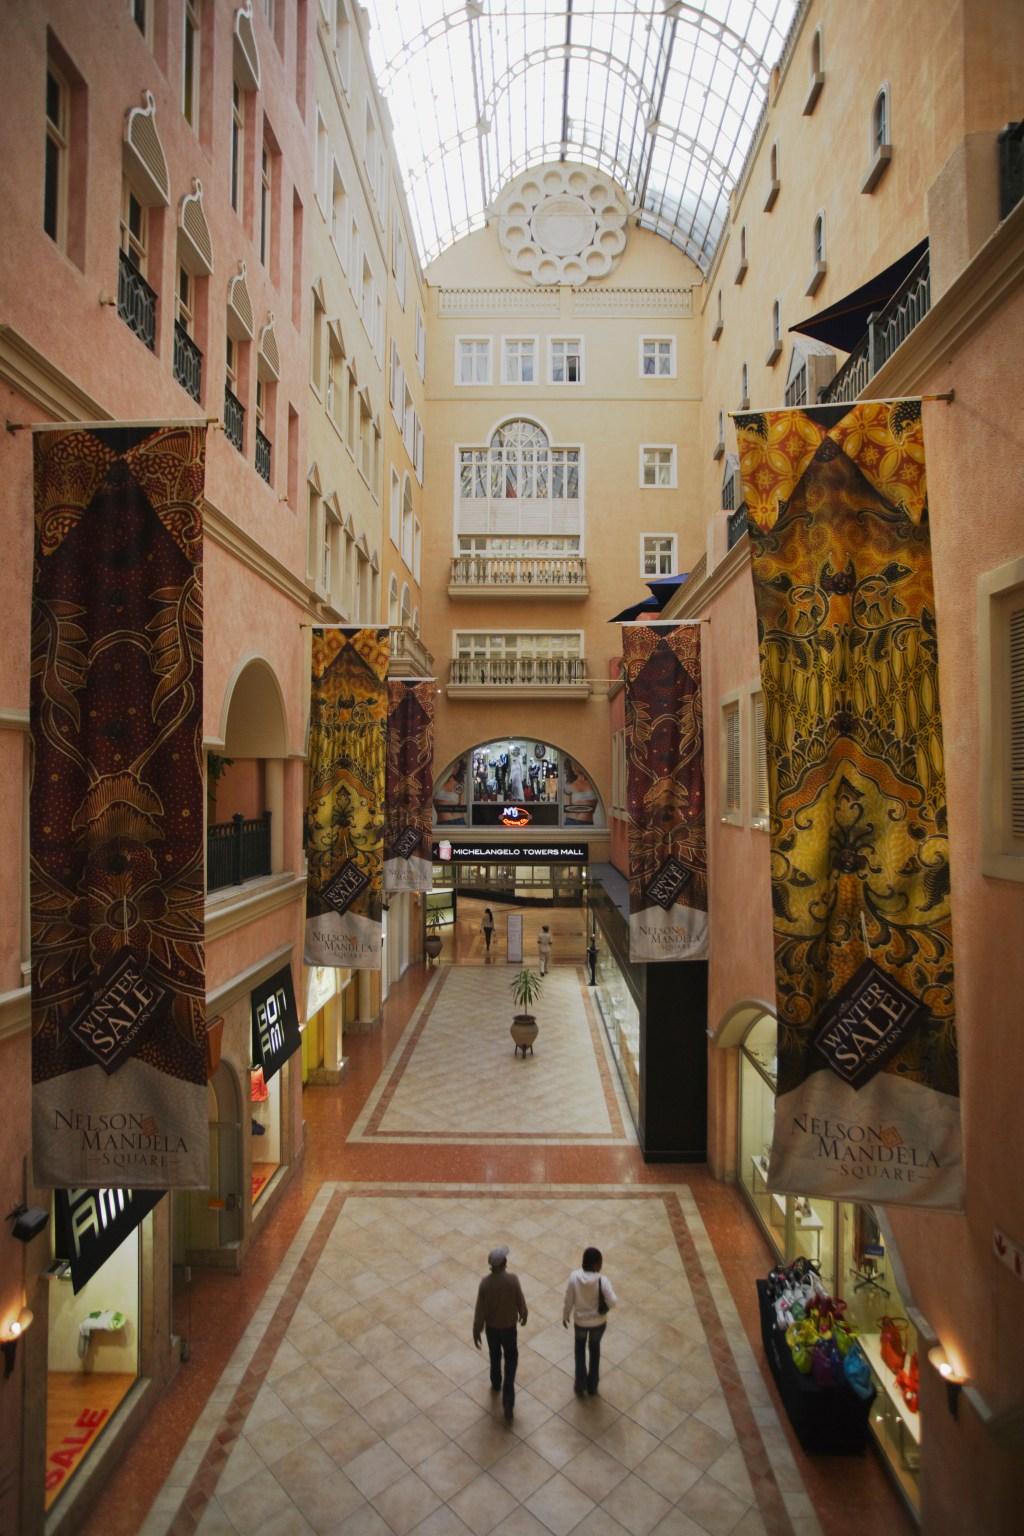 Interior of Nelson Mandela Square Mall, Sandton, Johannesburg, Gauteng, South Africa